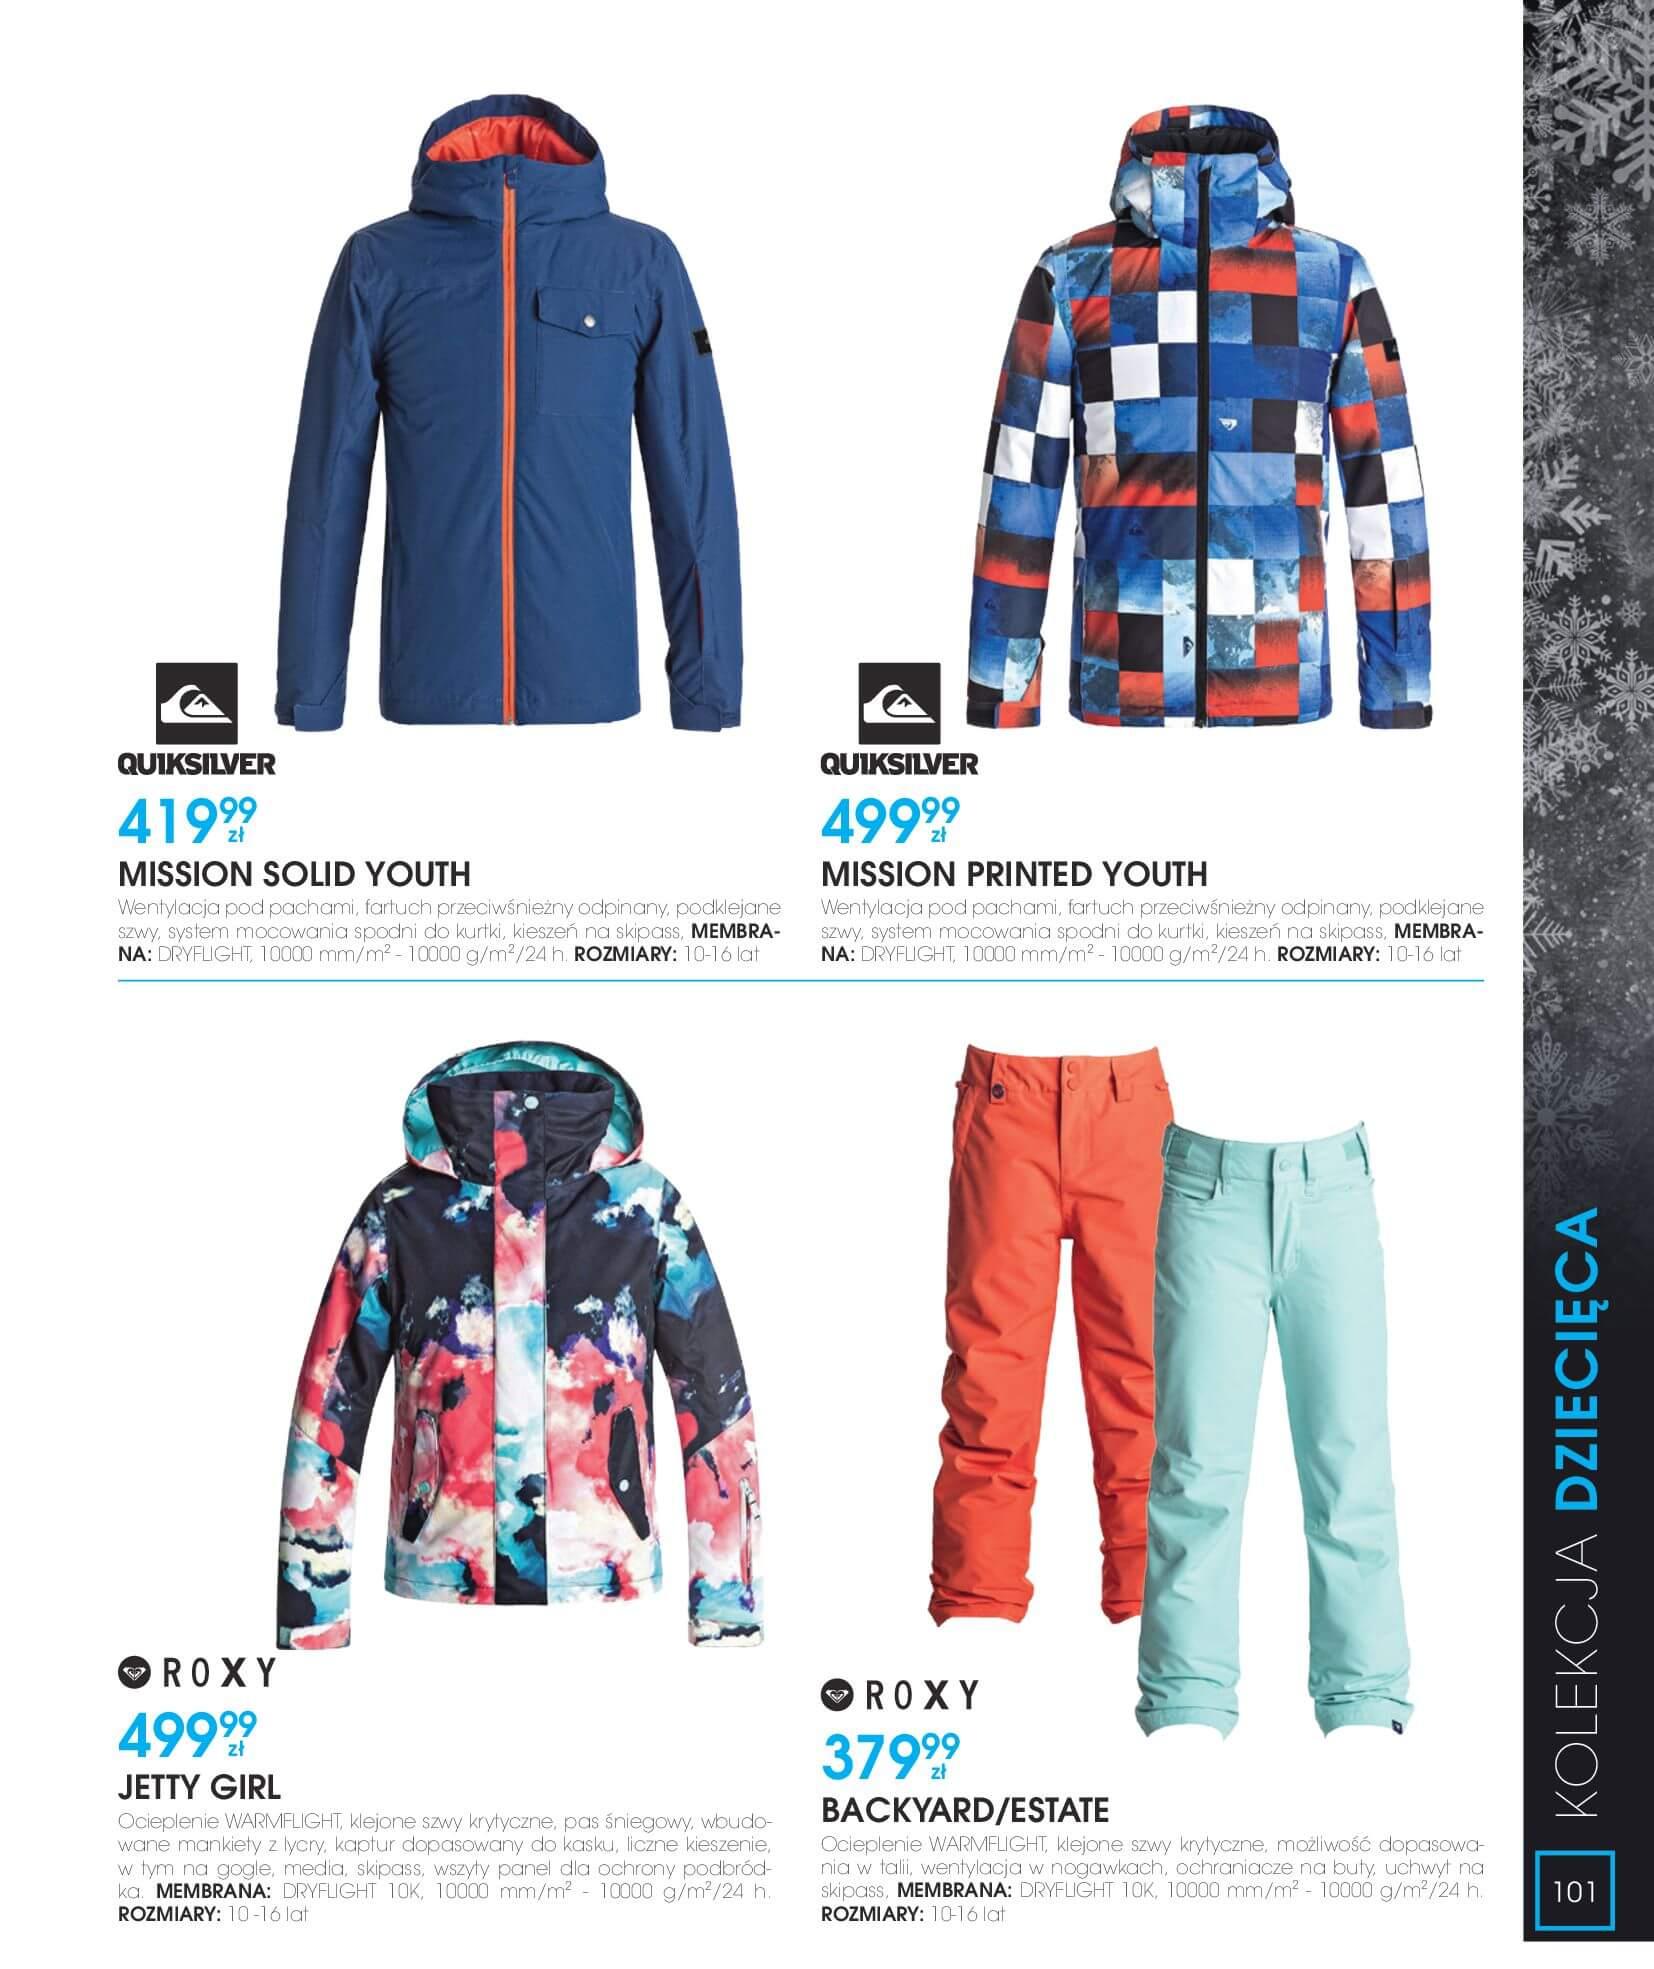 Gazetka Go Sport - Katalog Zima 2017/2018-12.11.2017-28.02.2018-page-101